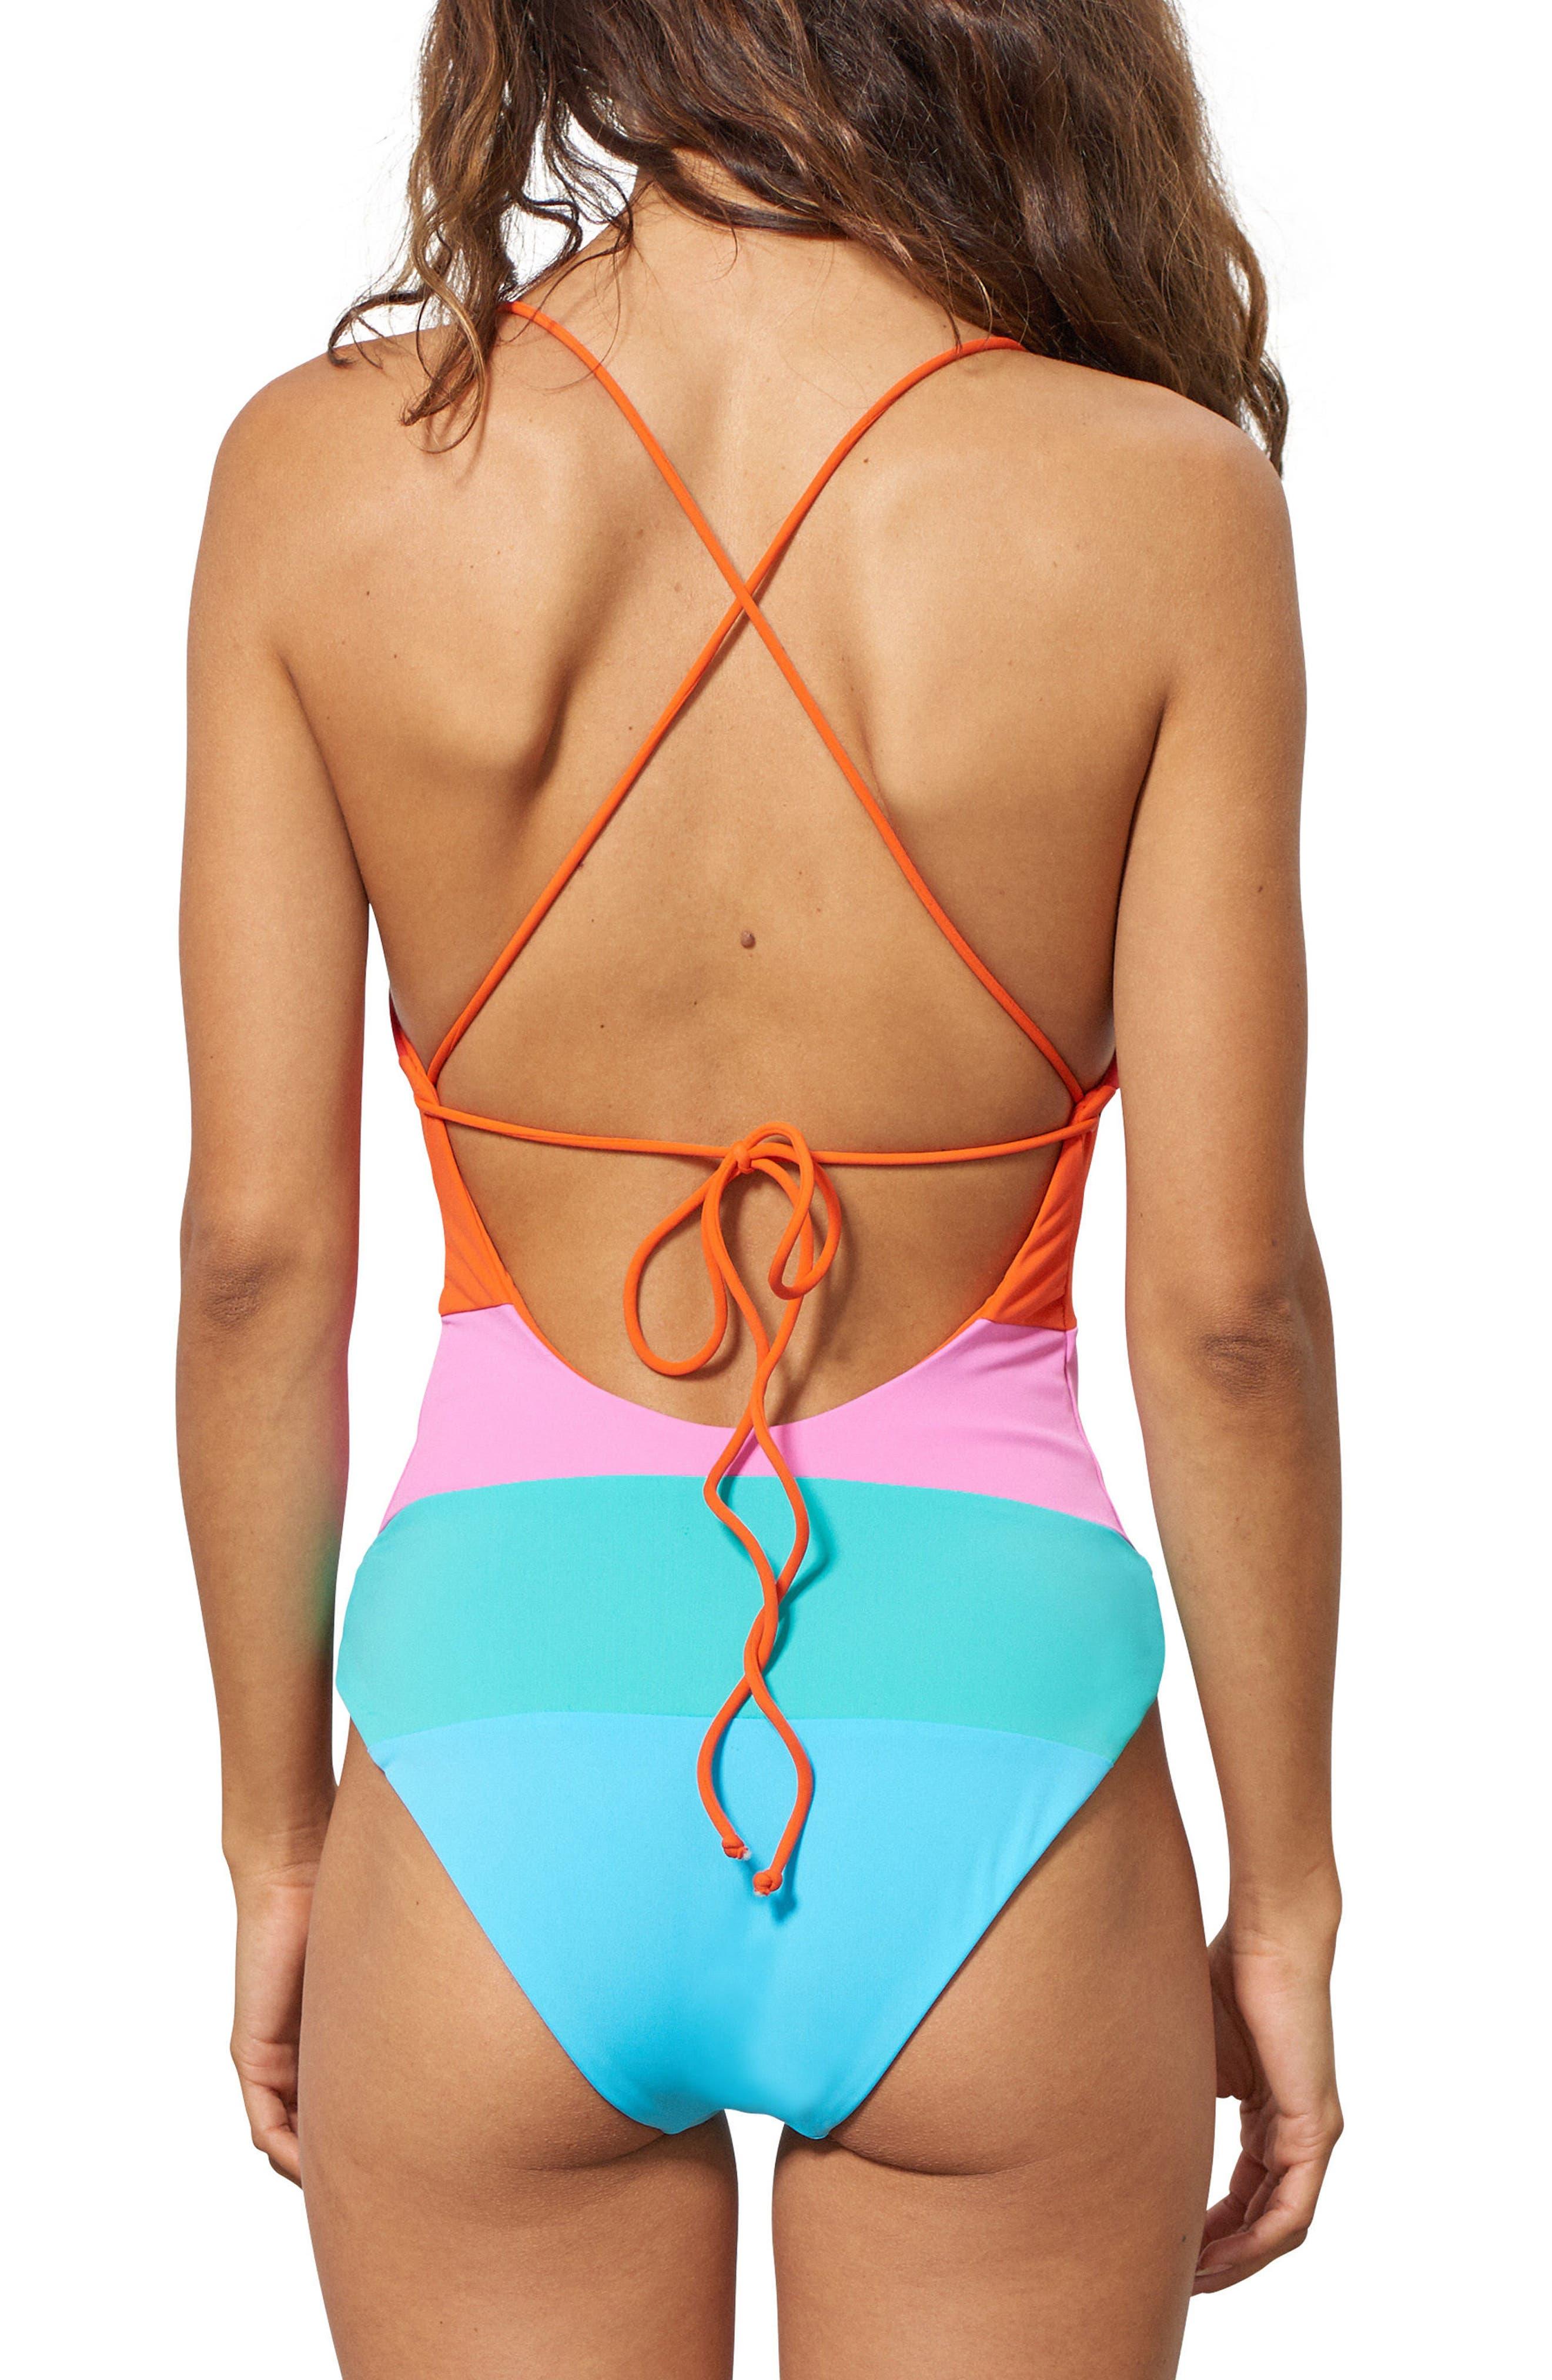 Olympia One-Piece Swimsuit,                             Alternate thumbnail 2, color,                             Orange Multi